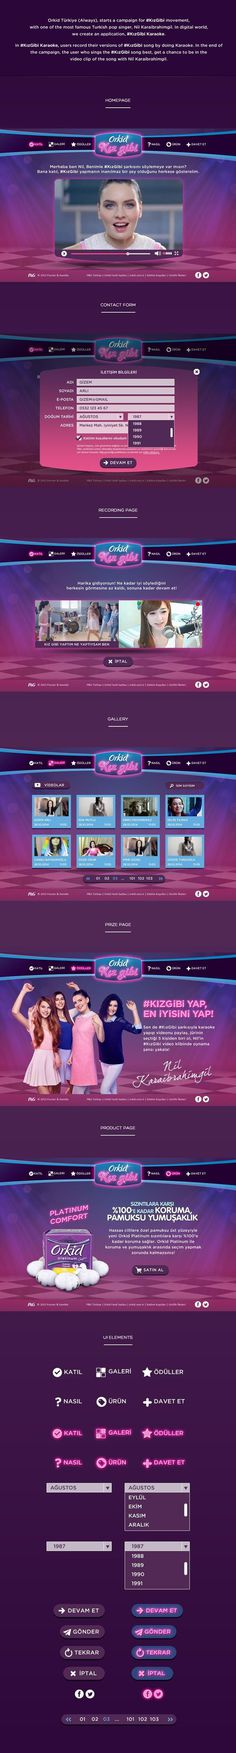 KızGibi Karaoke #website #neon